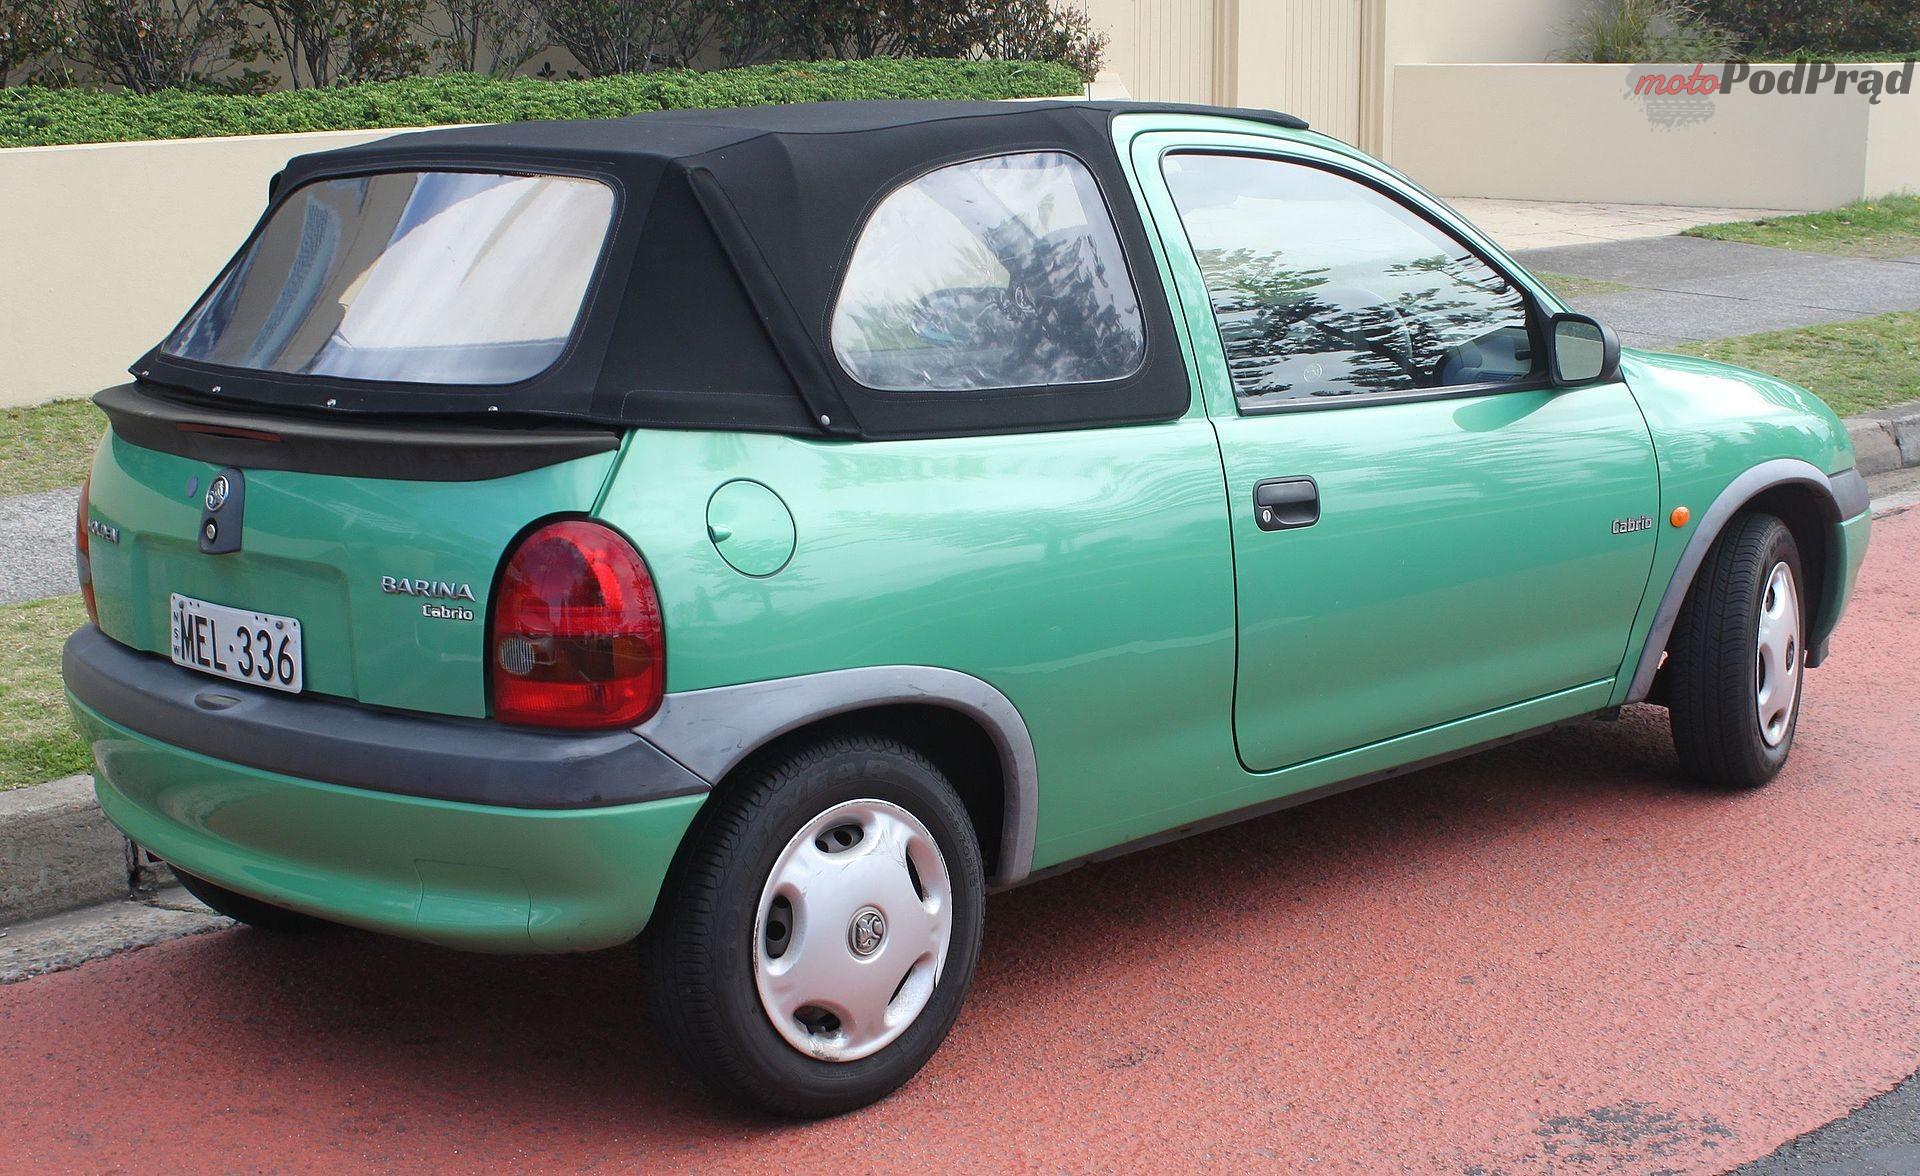 1998 Holden Barina SB Cabrio convertible 21680377273 Znalezione: Opel Corsa B kombi. Jedyna taka!